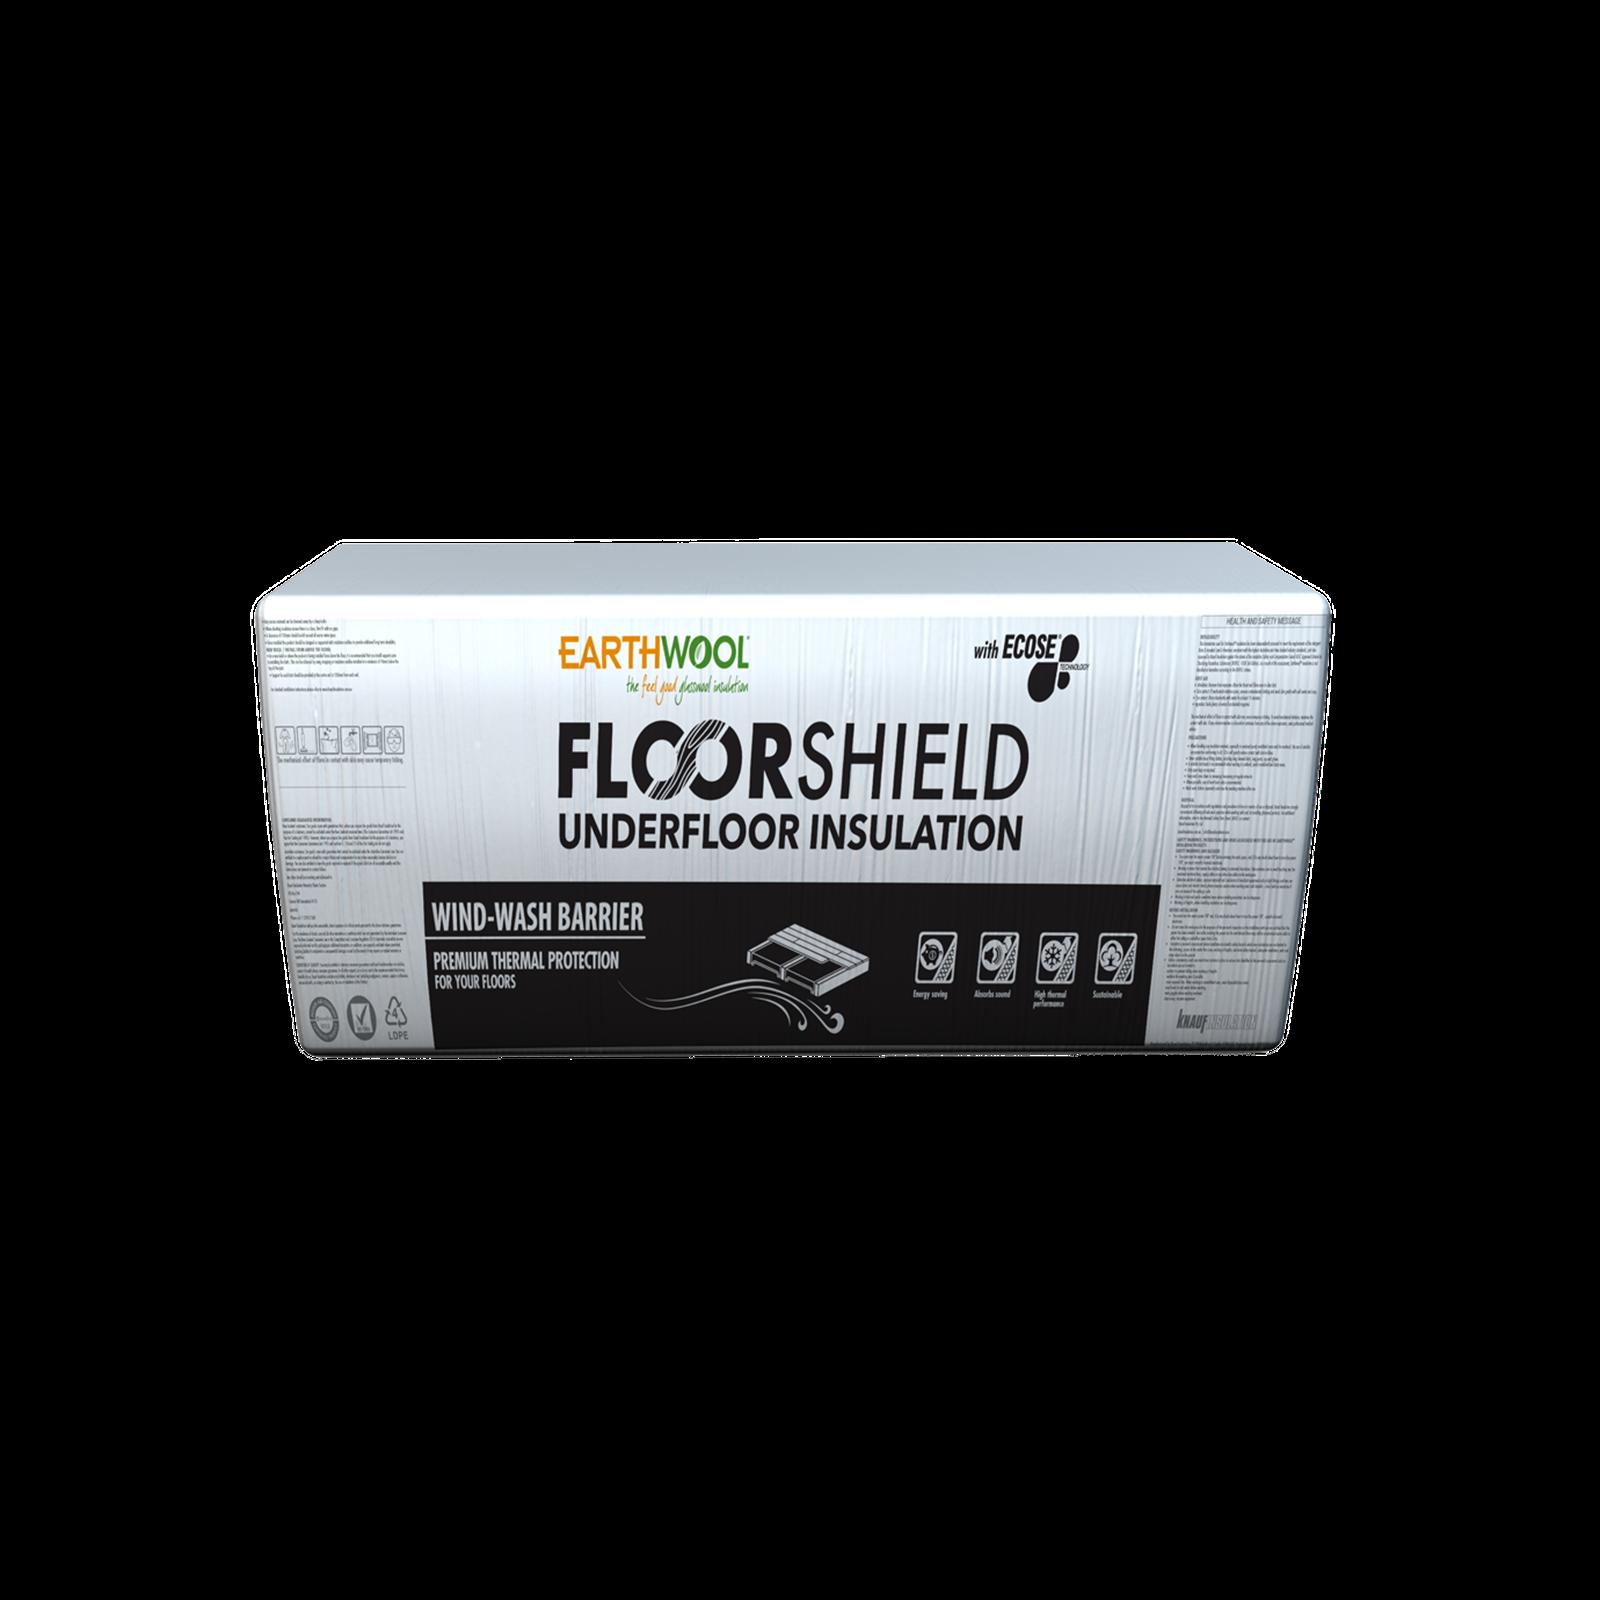 Earthwool R2.5 90mm x 420mm x 1160mm 2.92m² Insulation FloorShield Underfloor Batt - Pack of 6